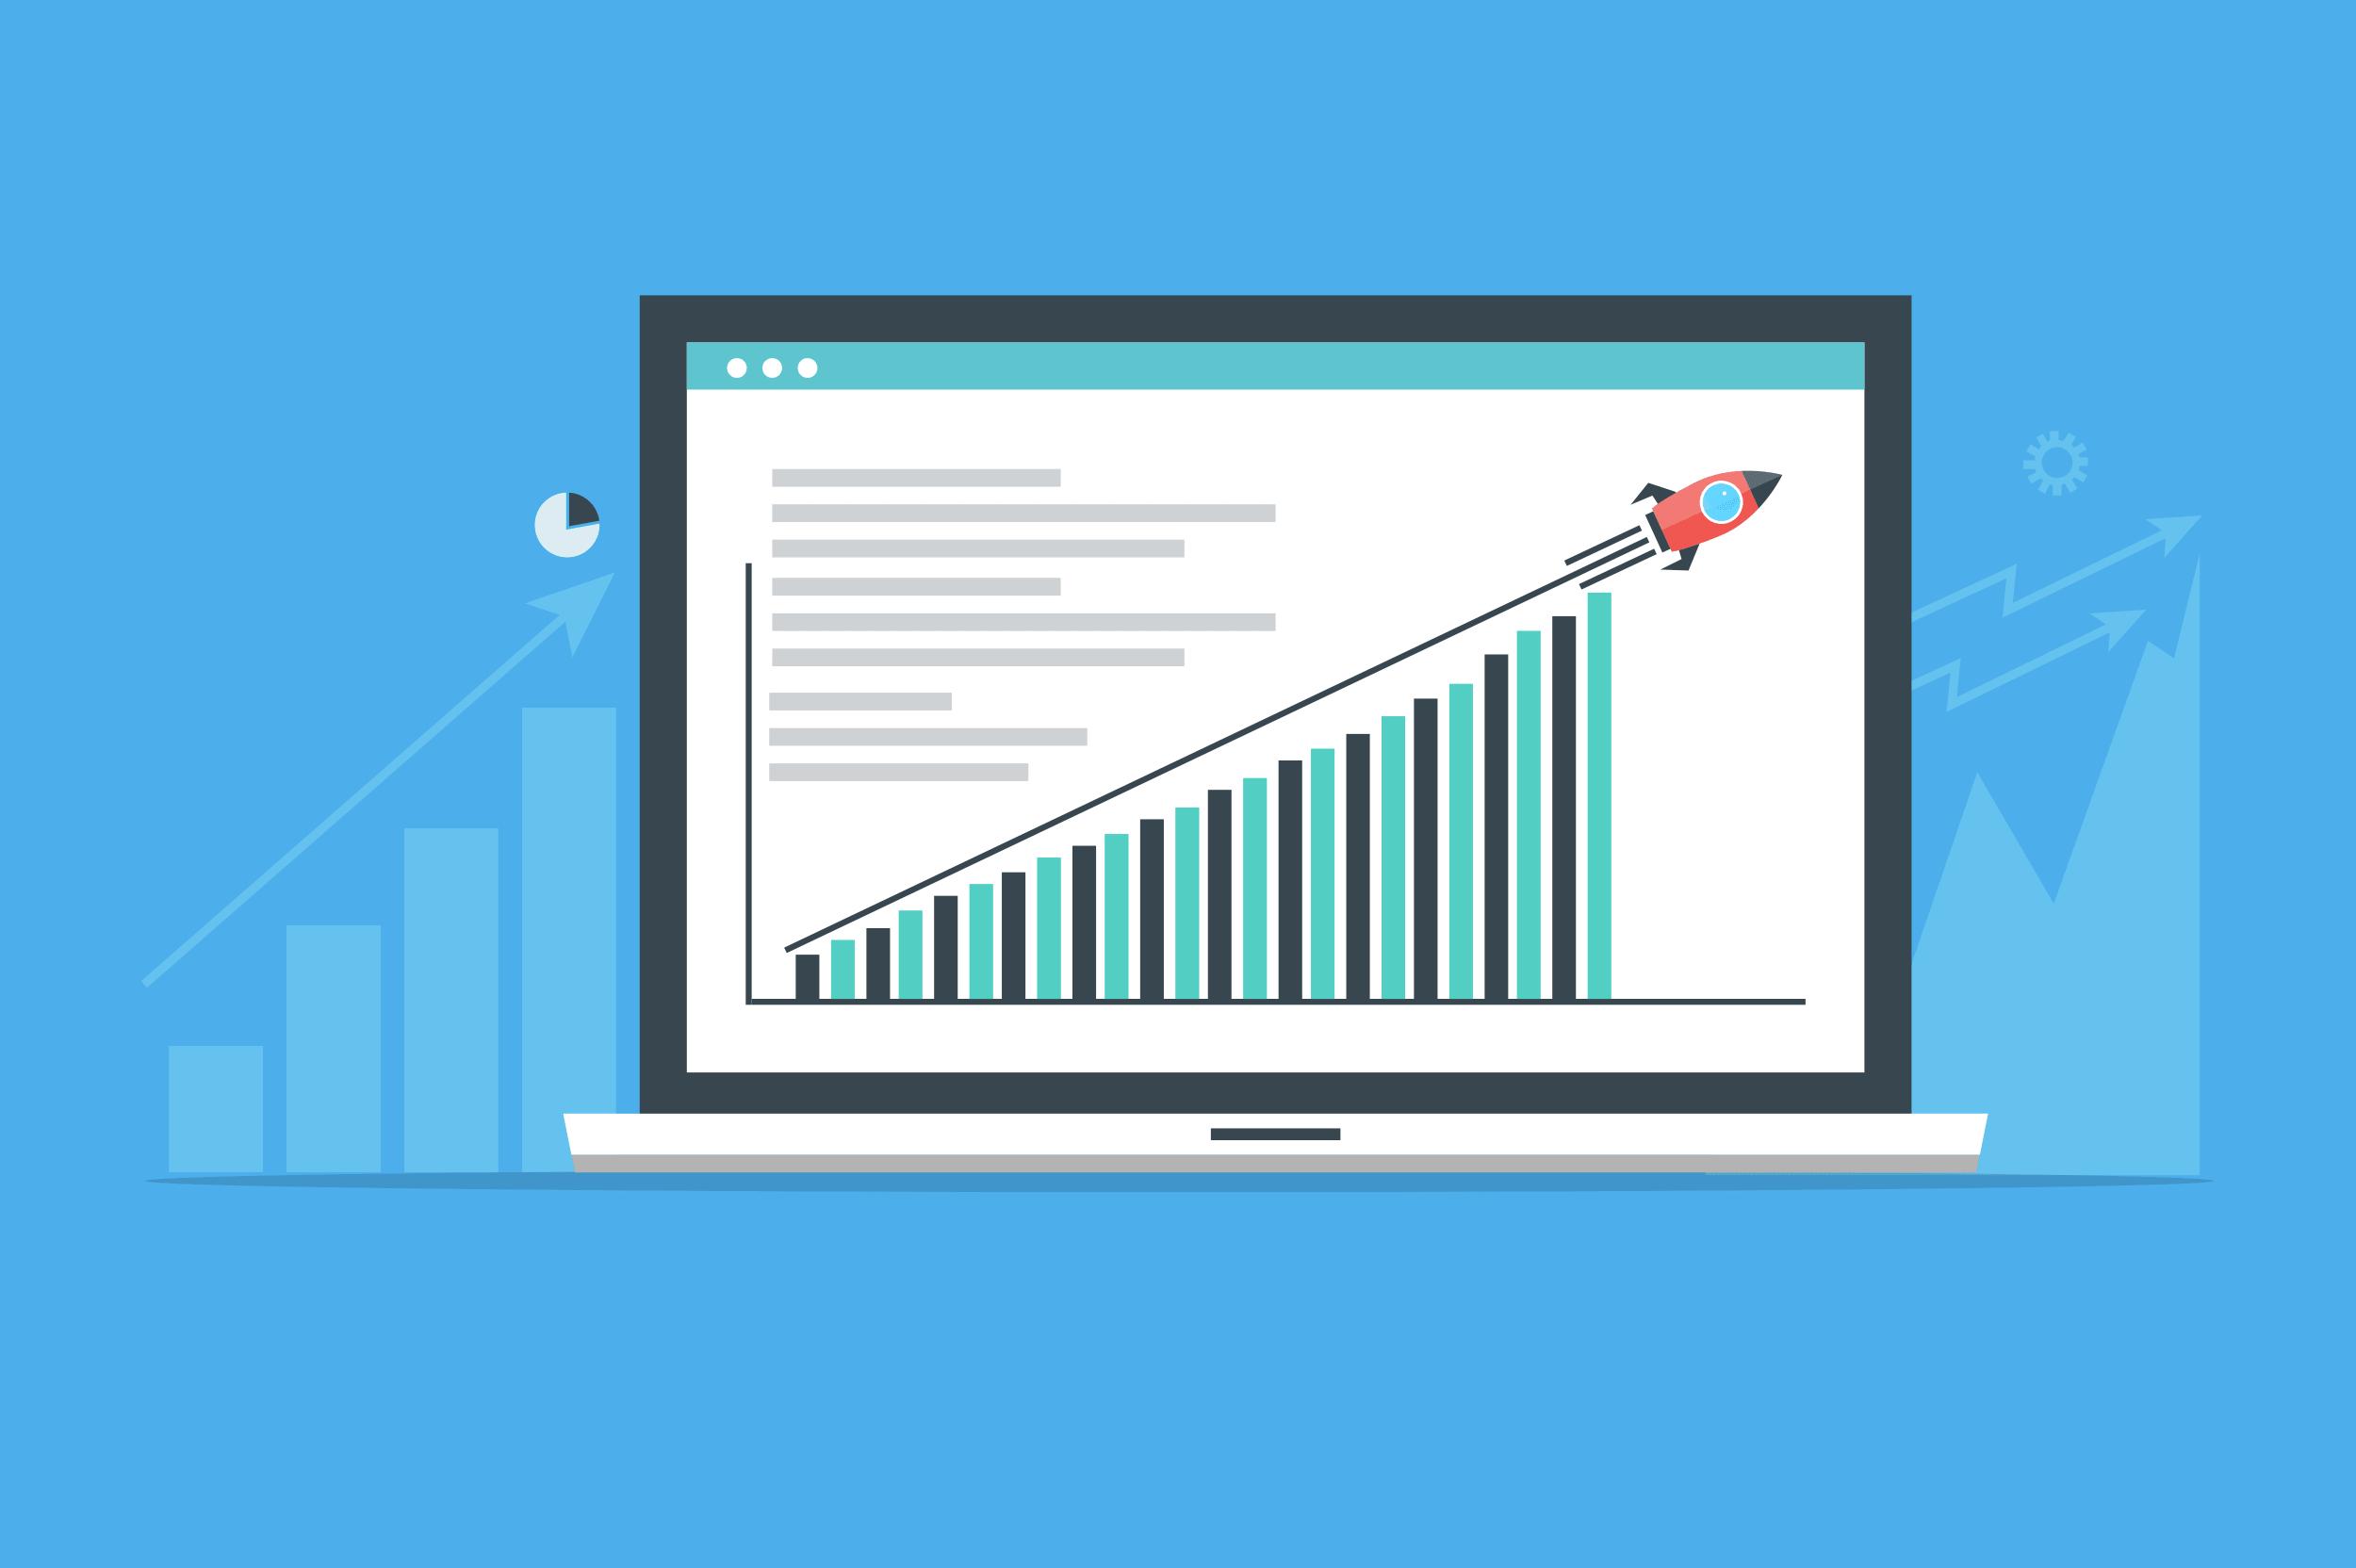 Guaranteed Methods for Increasing Website Traffic